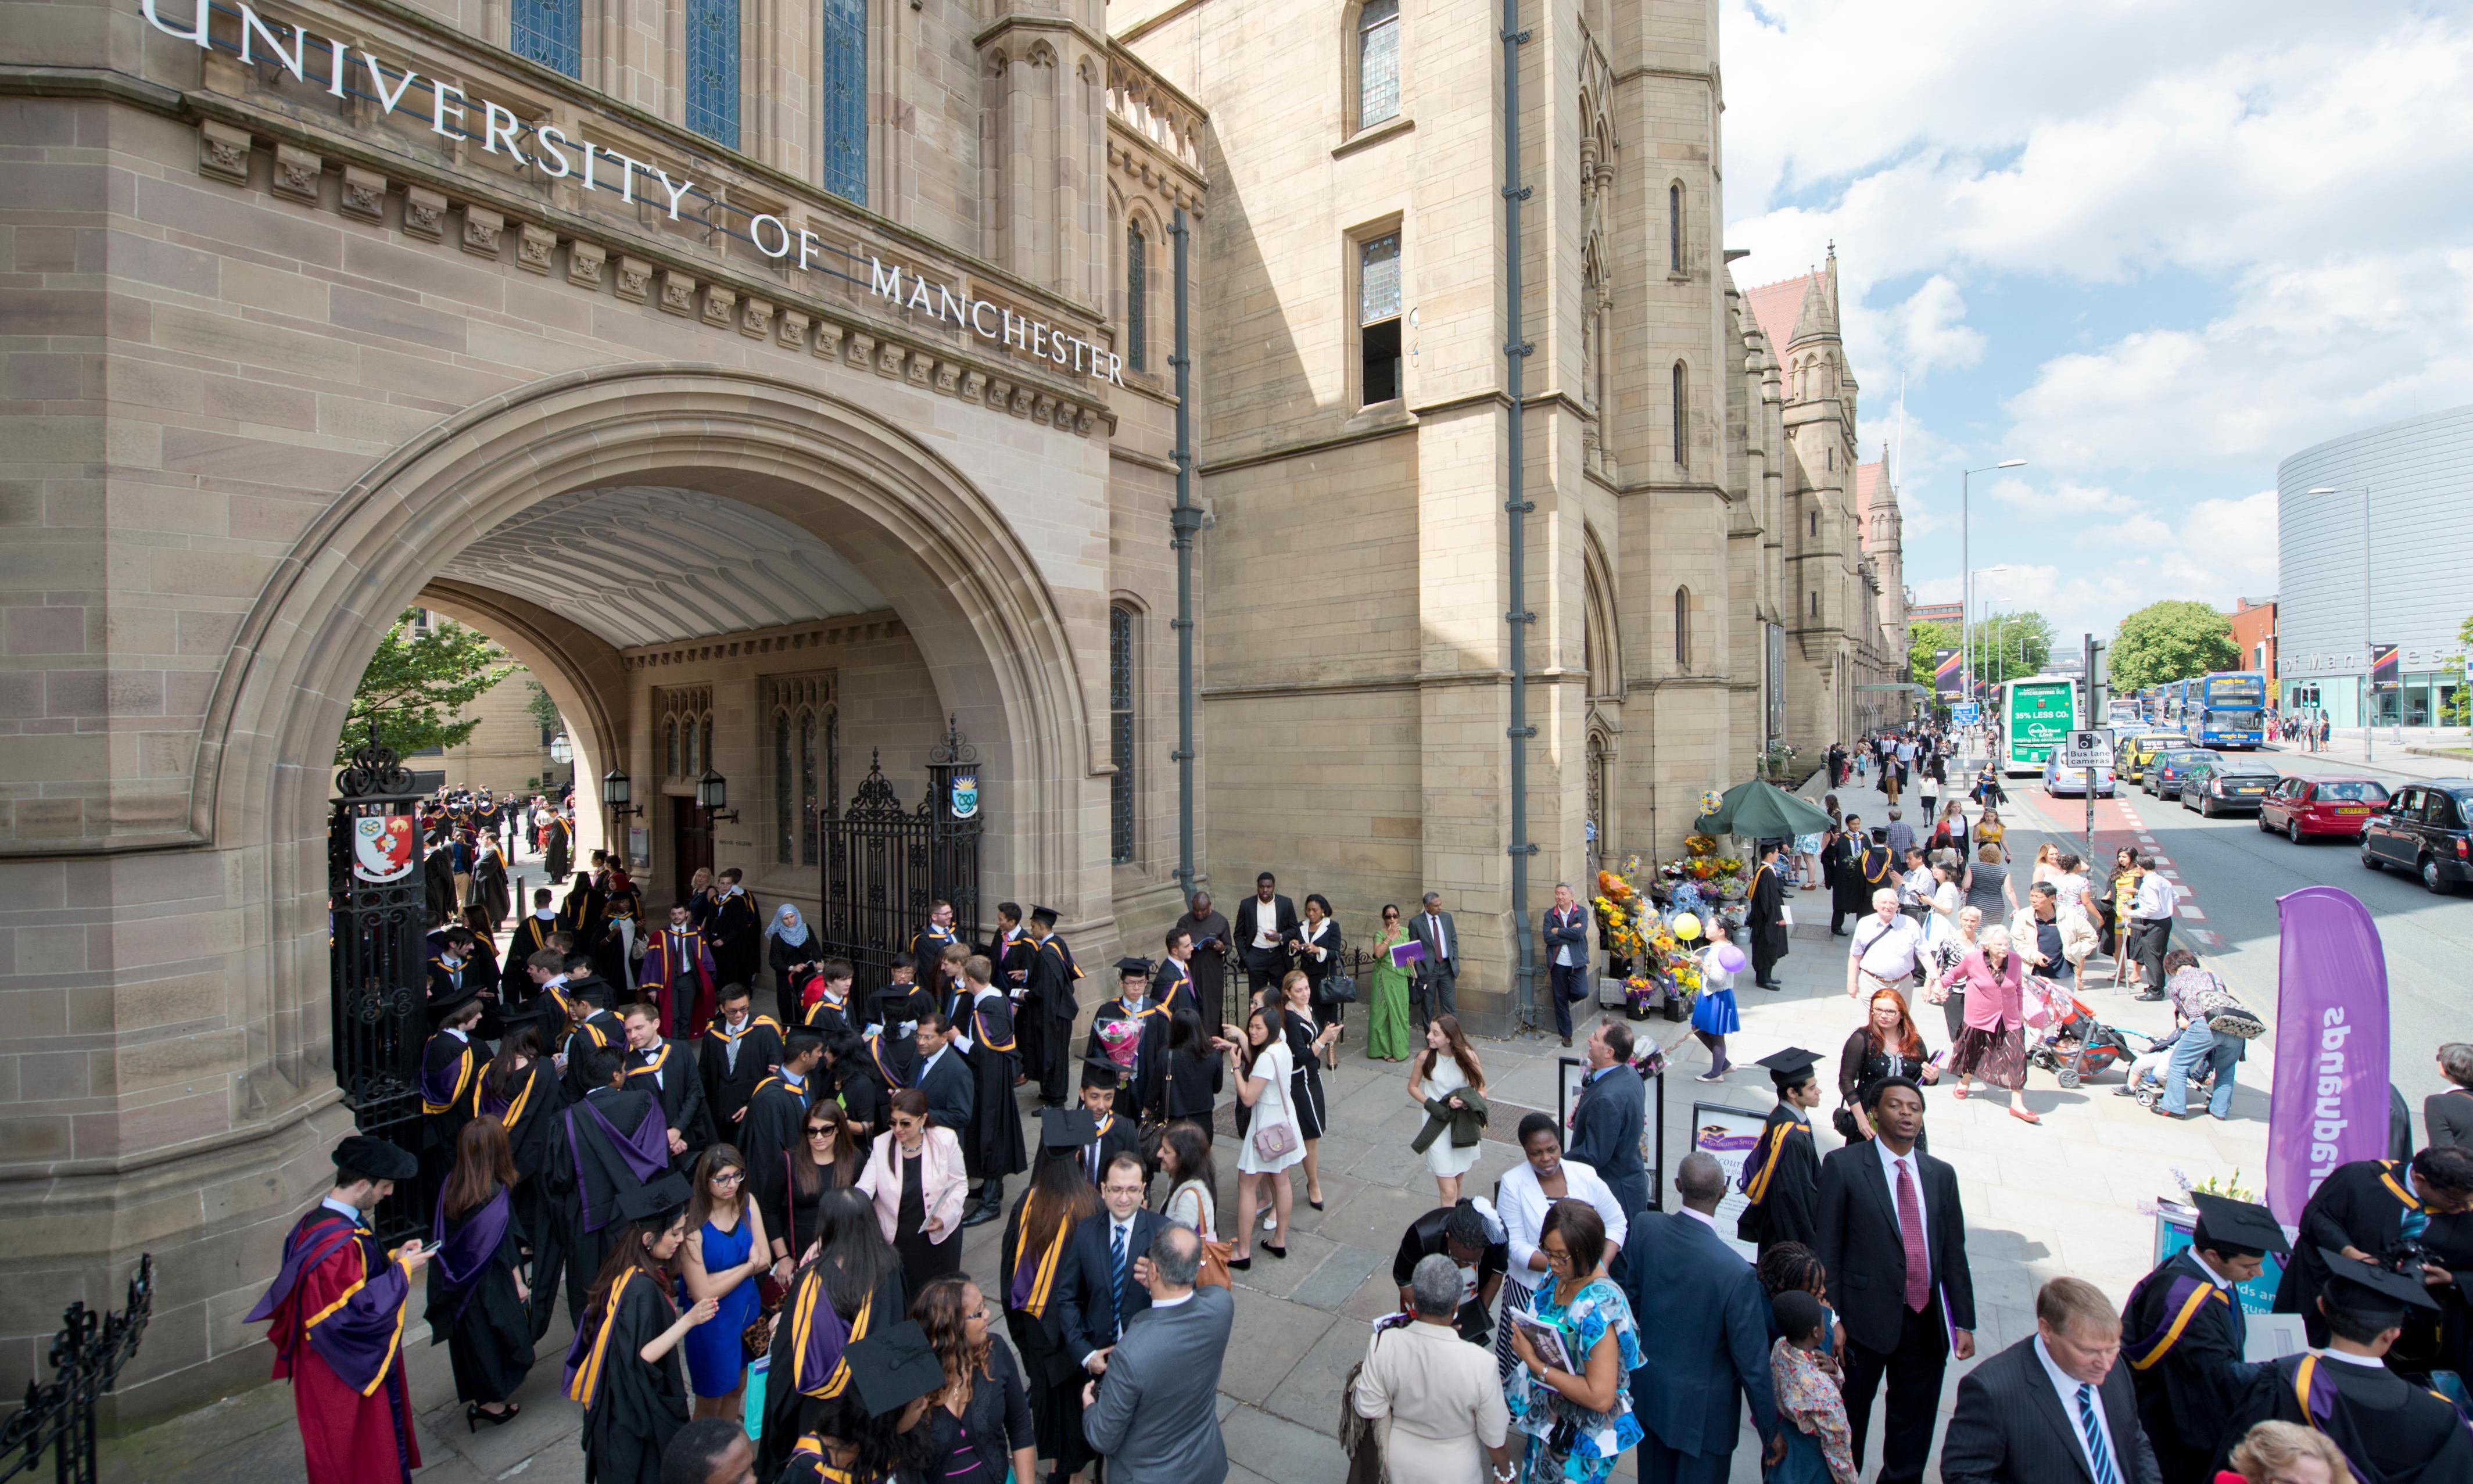 UK universities welcome U-turn on student visas